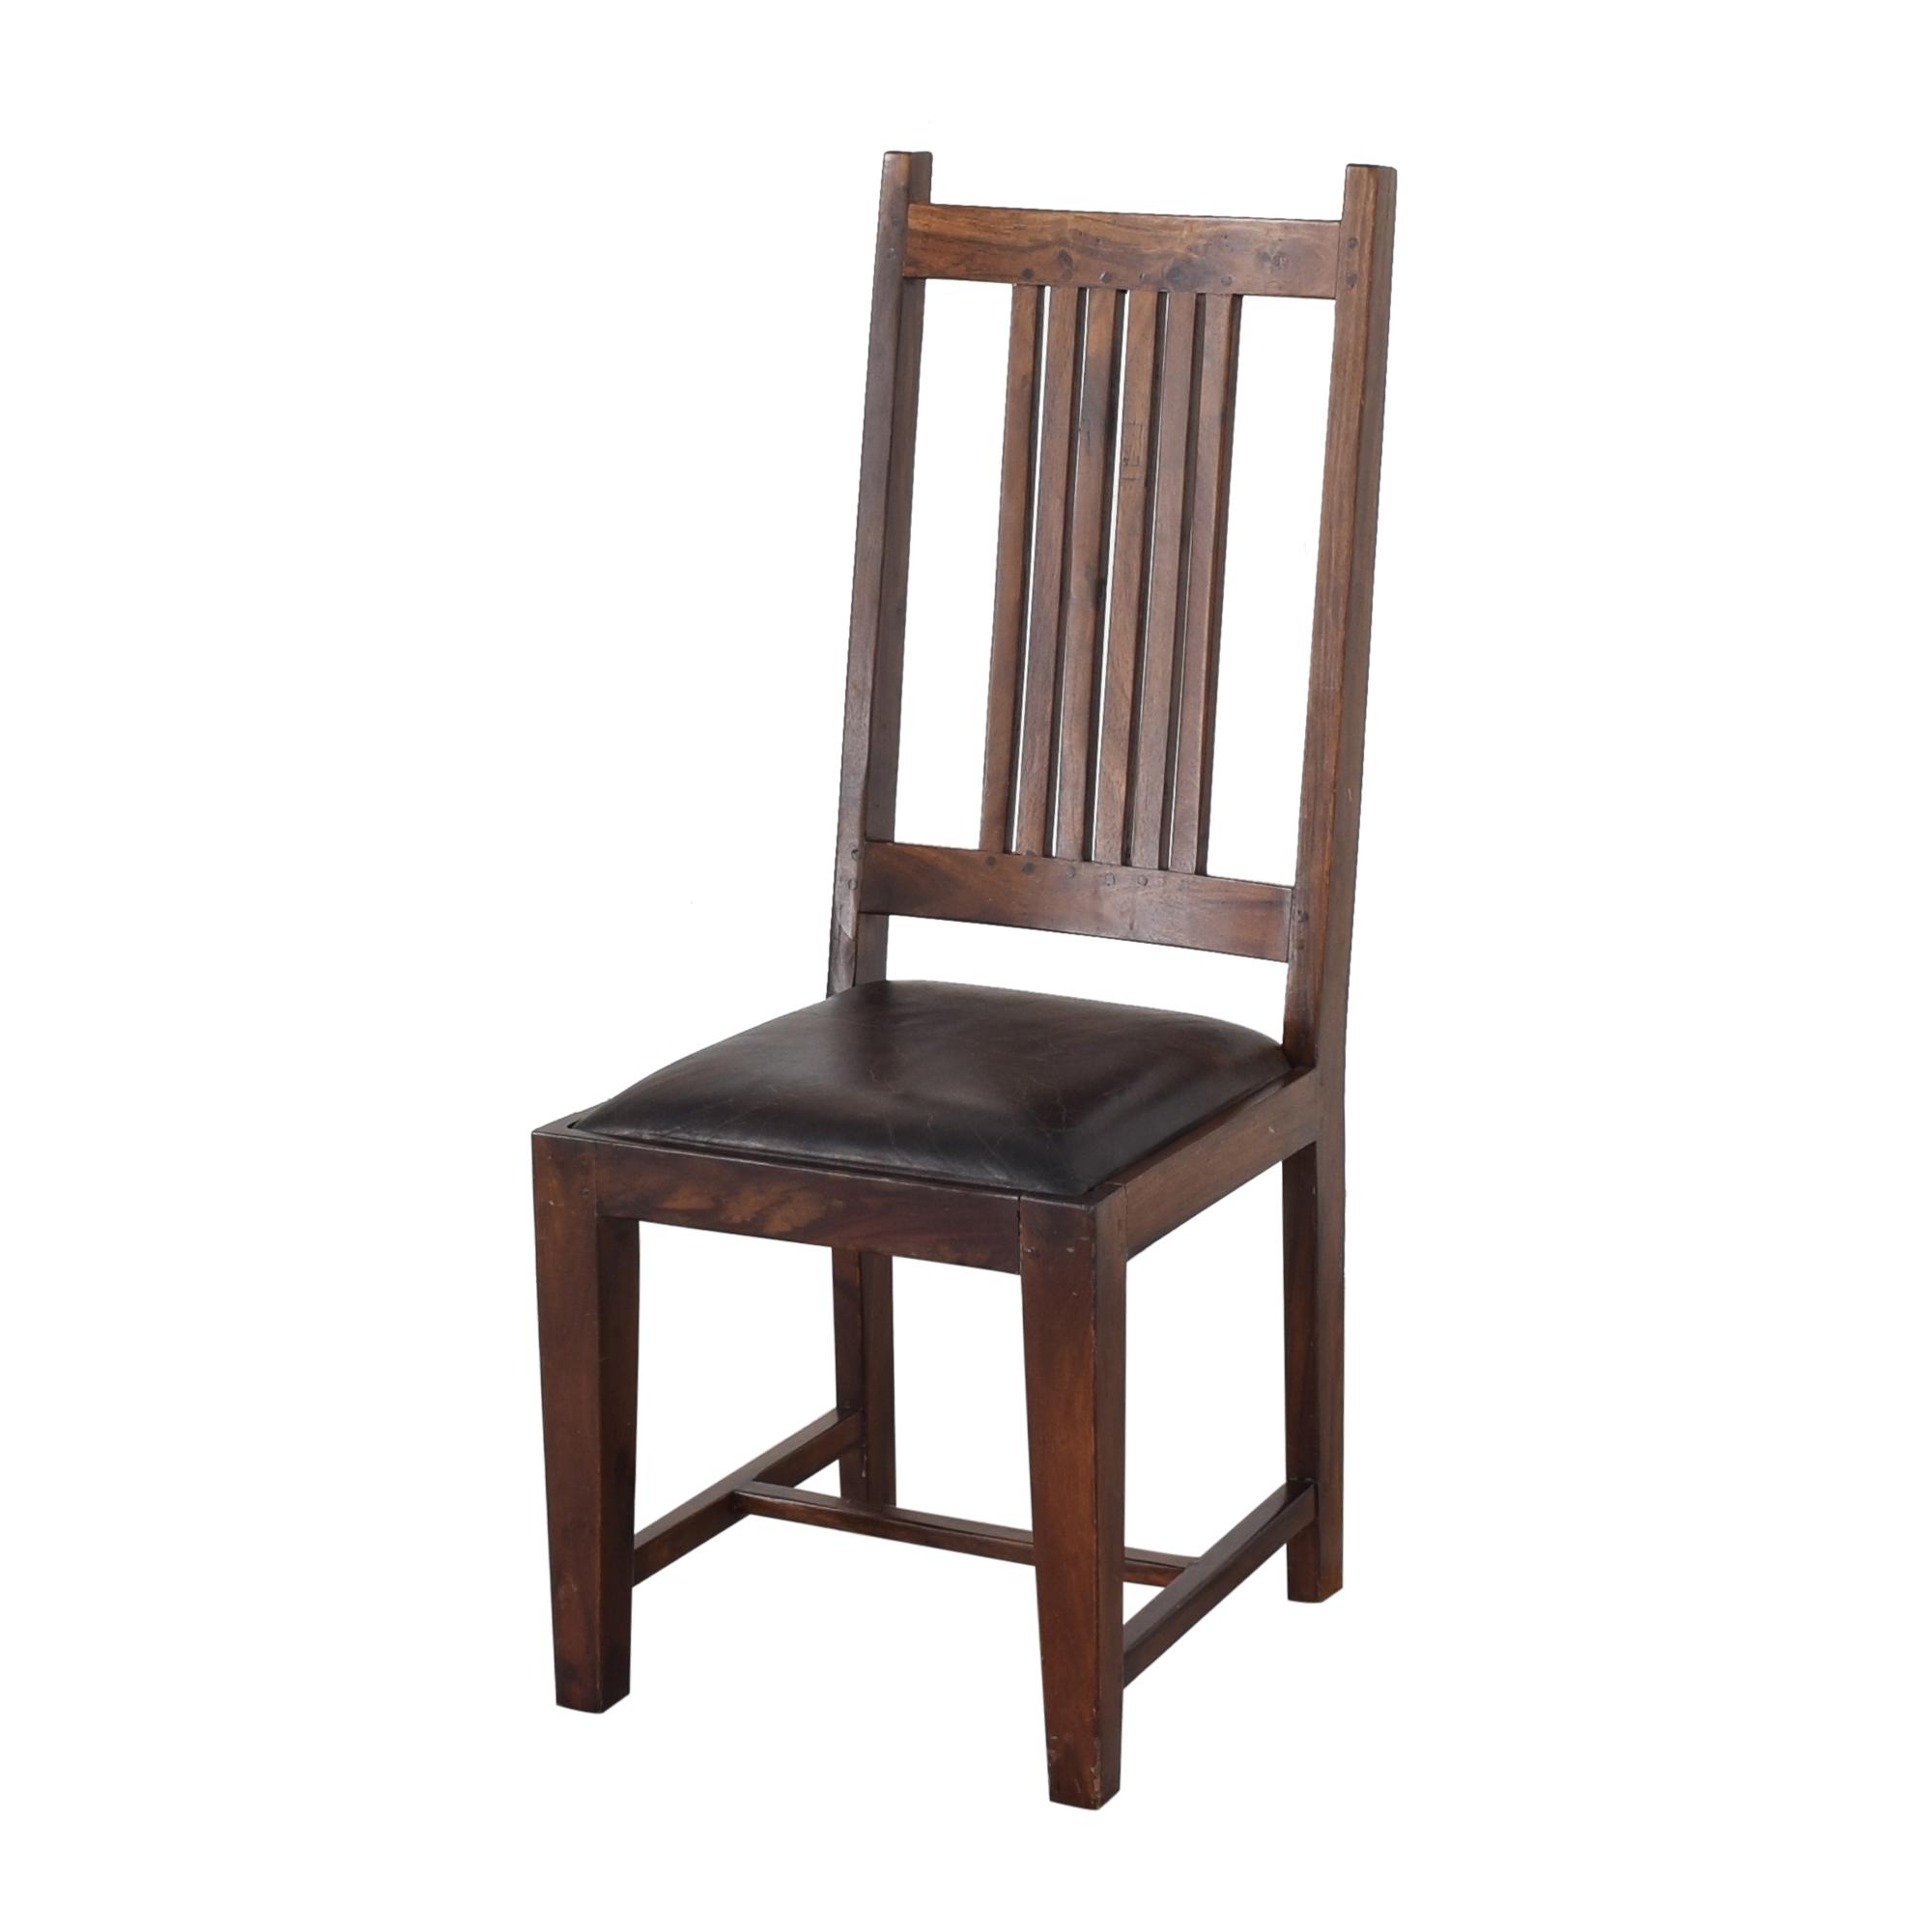 shop ABC Carpet & Home ABC Carpet & Home Dining Chairs online